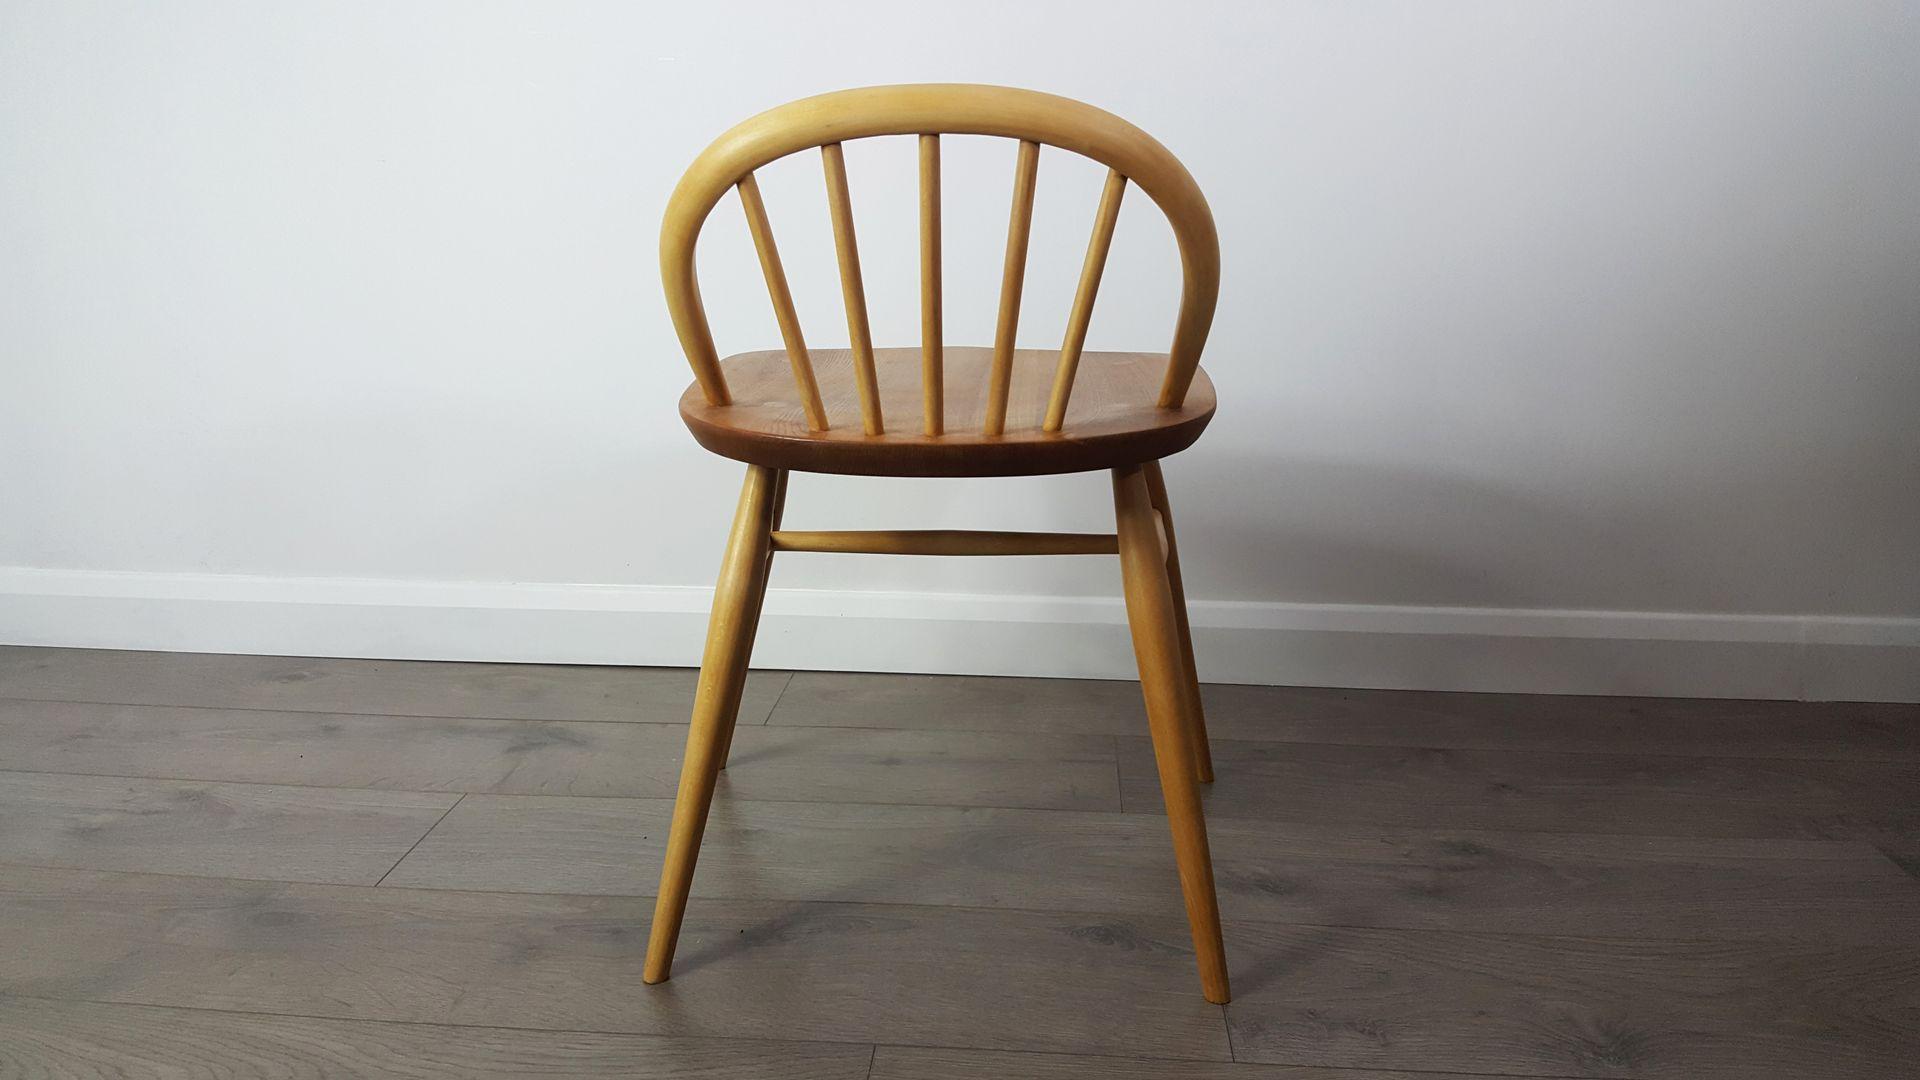 windsor stuhl von lucian ercolani f r ercol 1960er bei. Black Bedroom Furniture Sets. Home Design Ideas